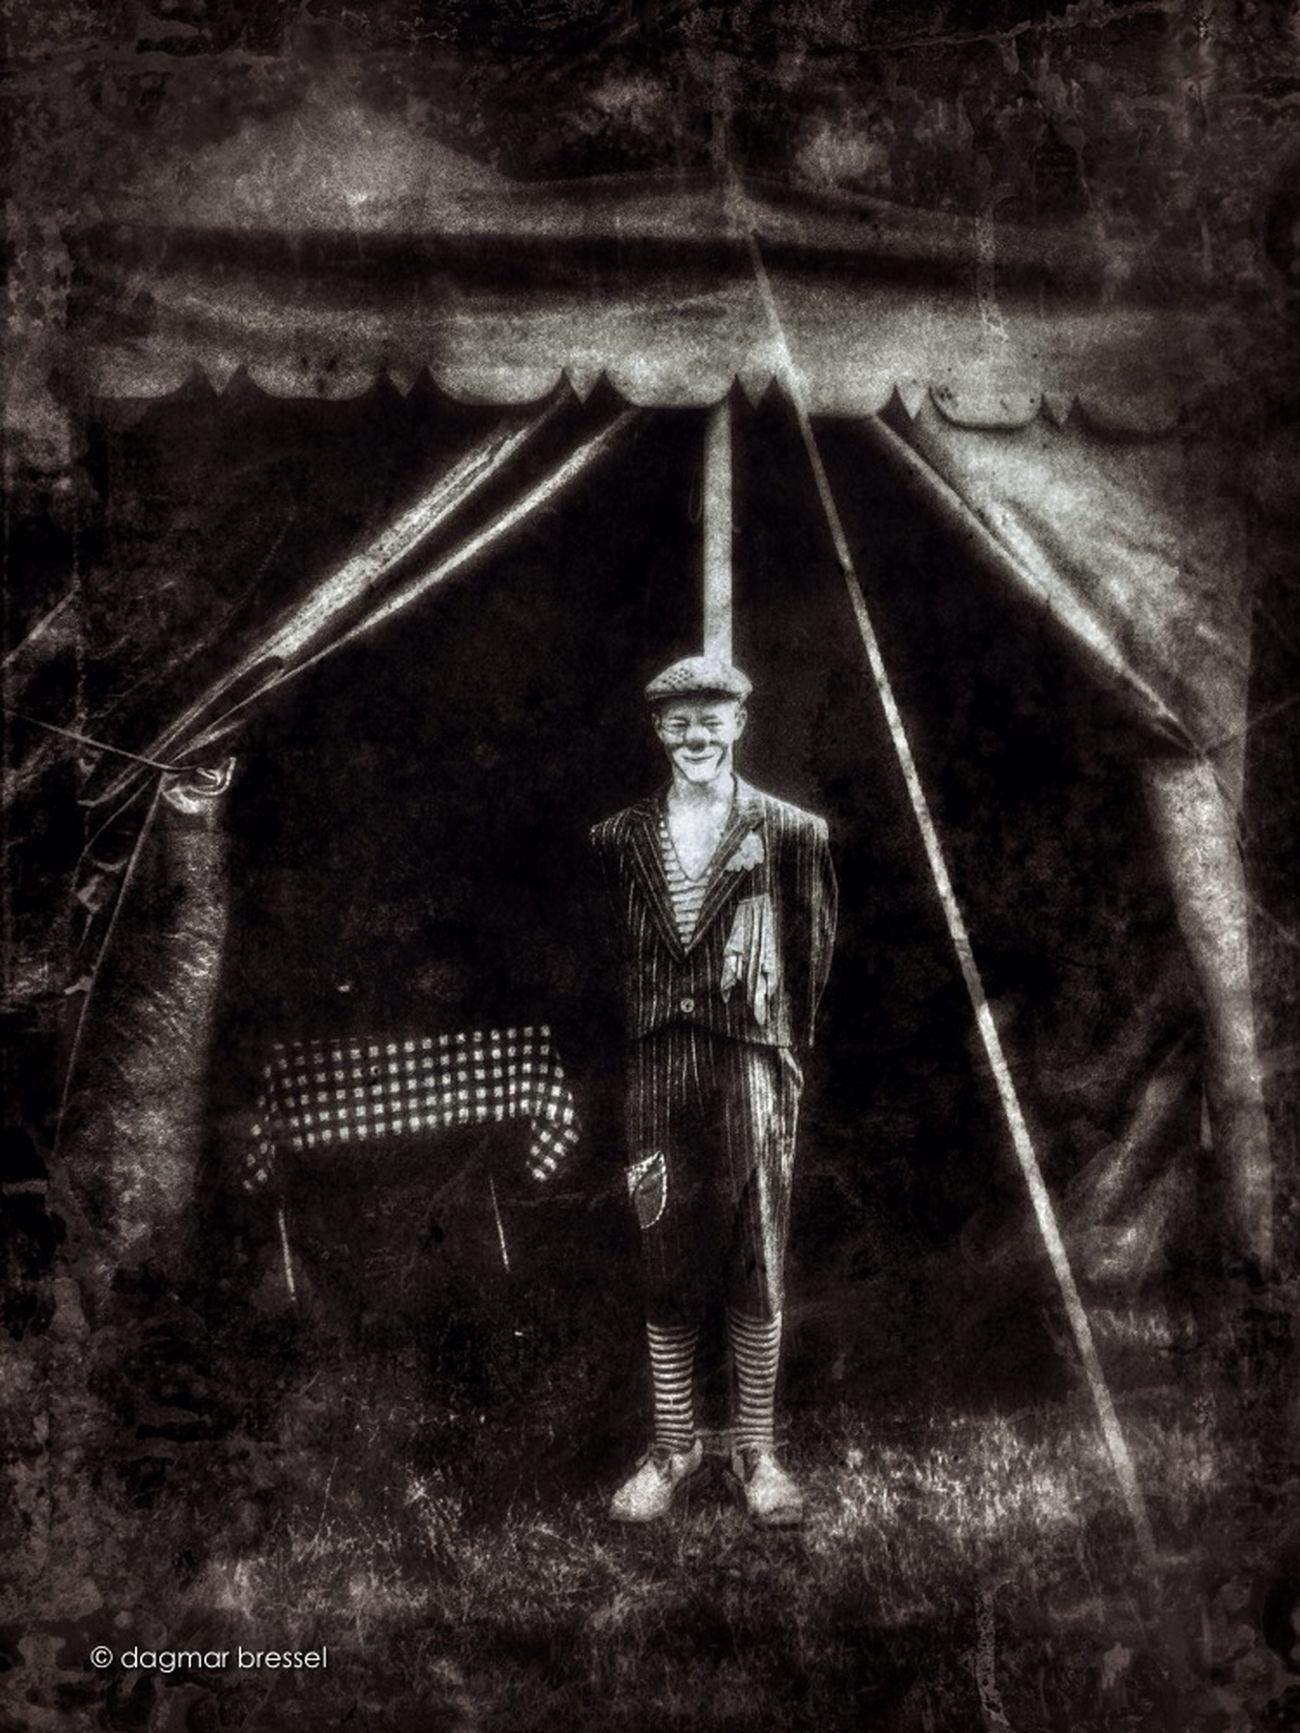 Circus Zirkus Blancoynegro WeAreJuxt.com Shootermag Monochromeart Momochrome Zirkus Charless Portrait Fine Art Photography